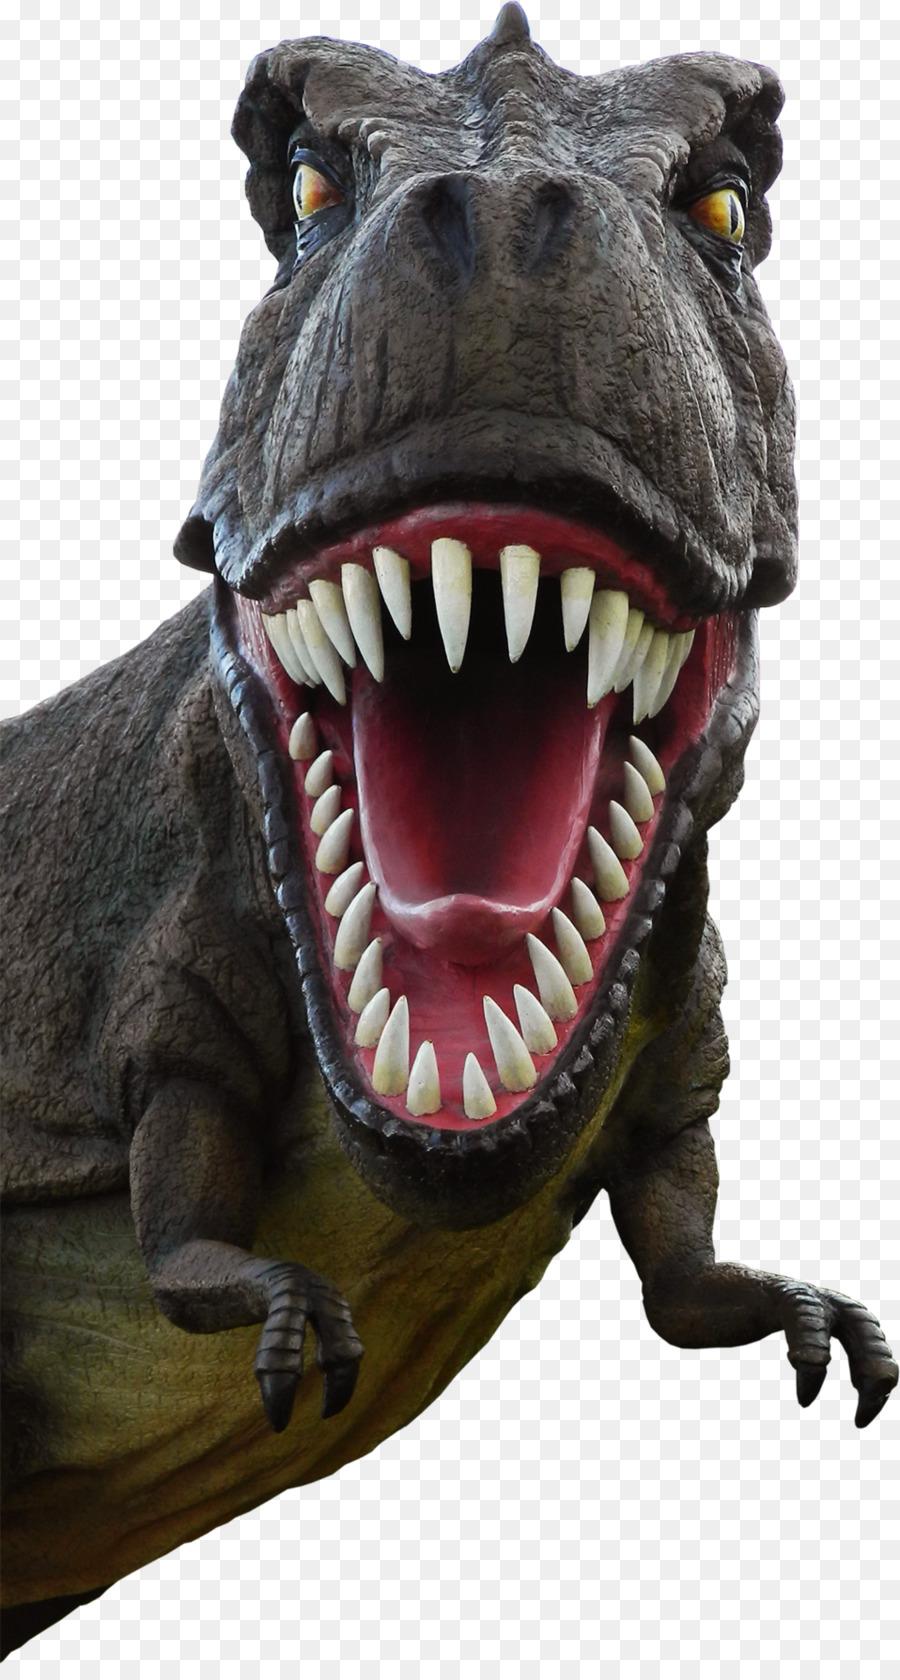 Tooth cartoon transparent . Clipart dinosaur mouth